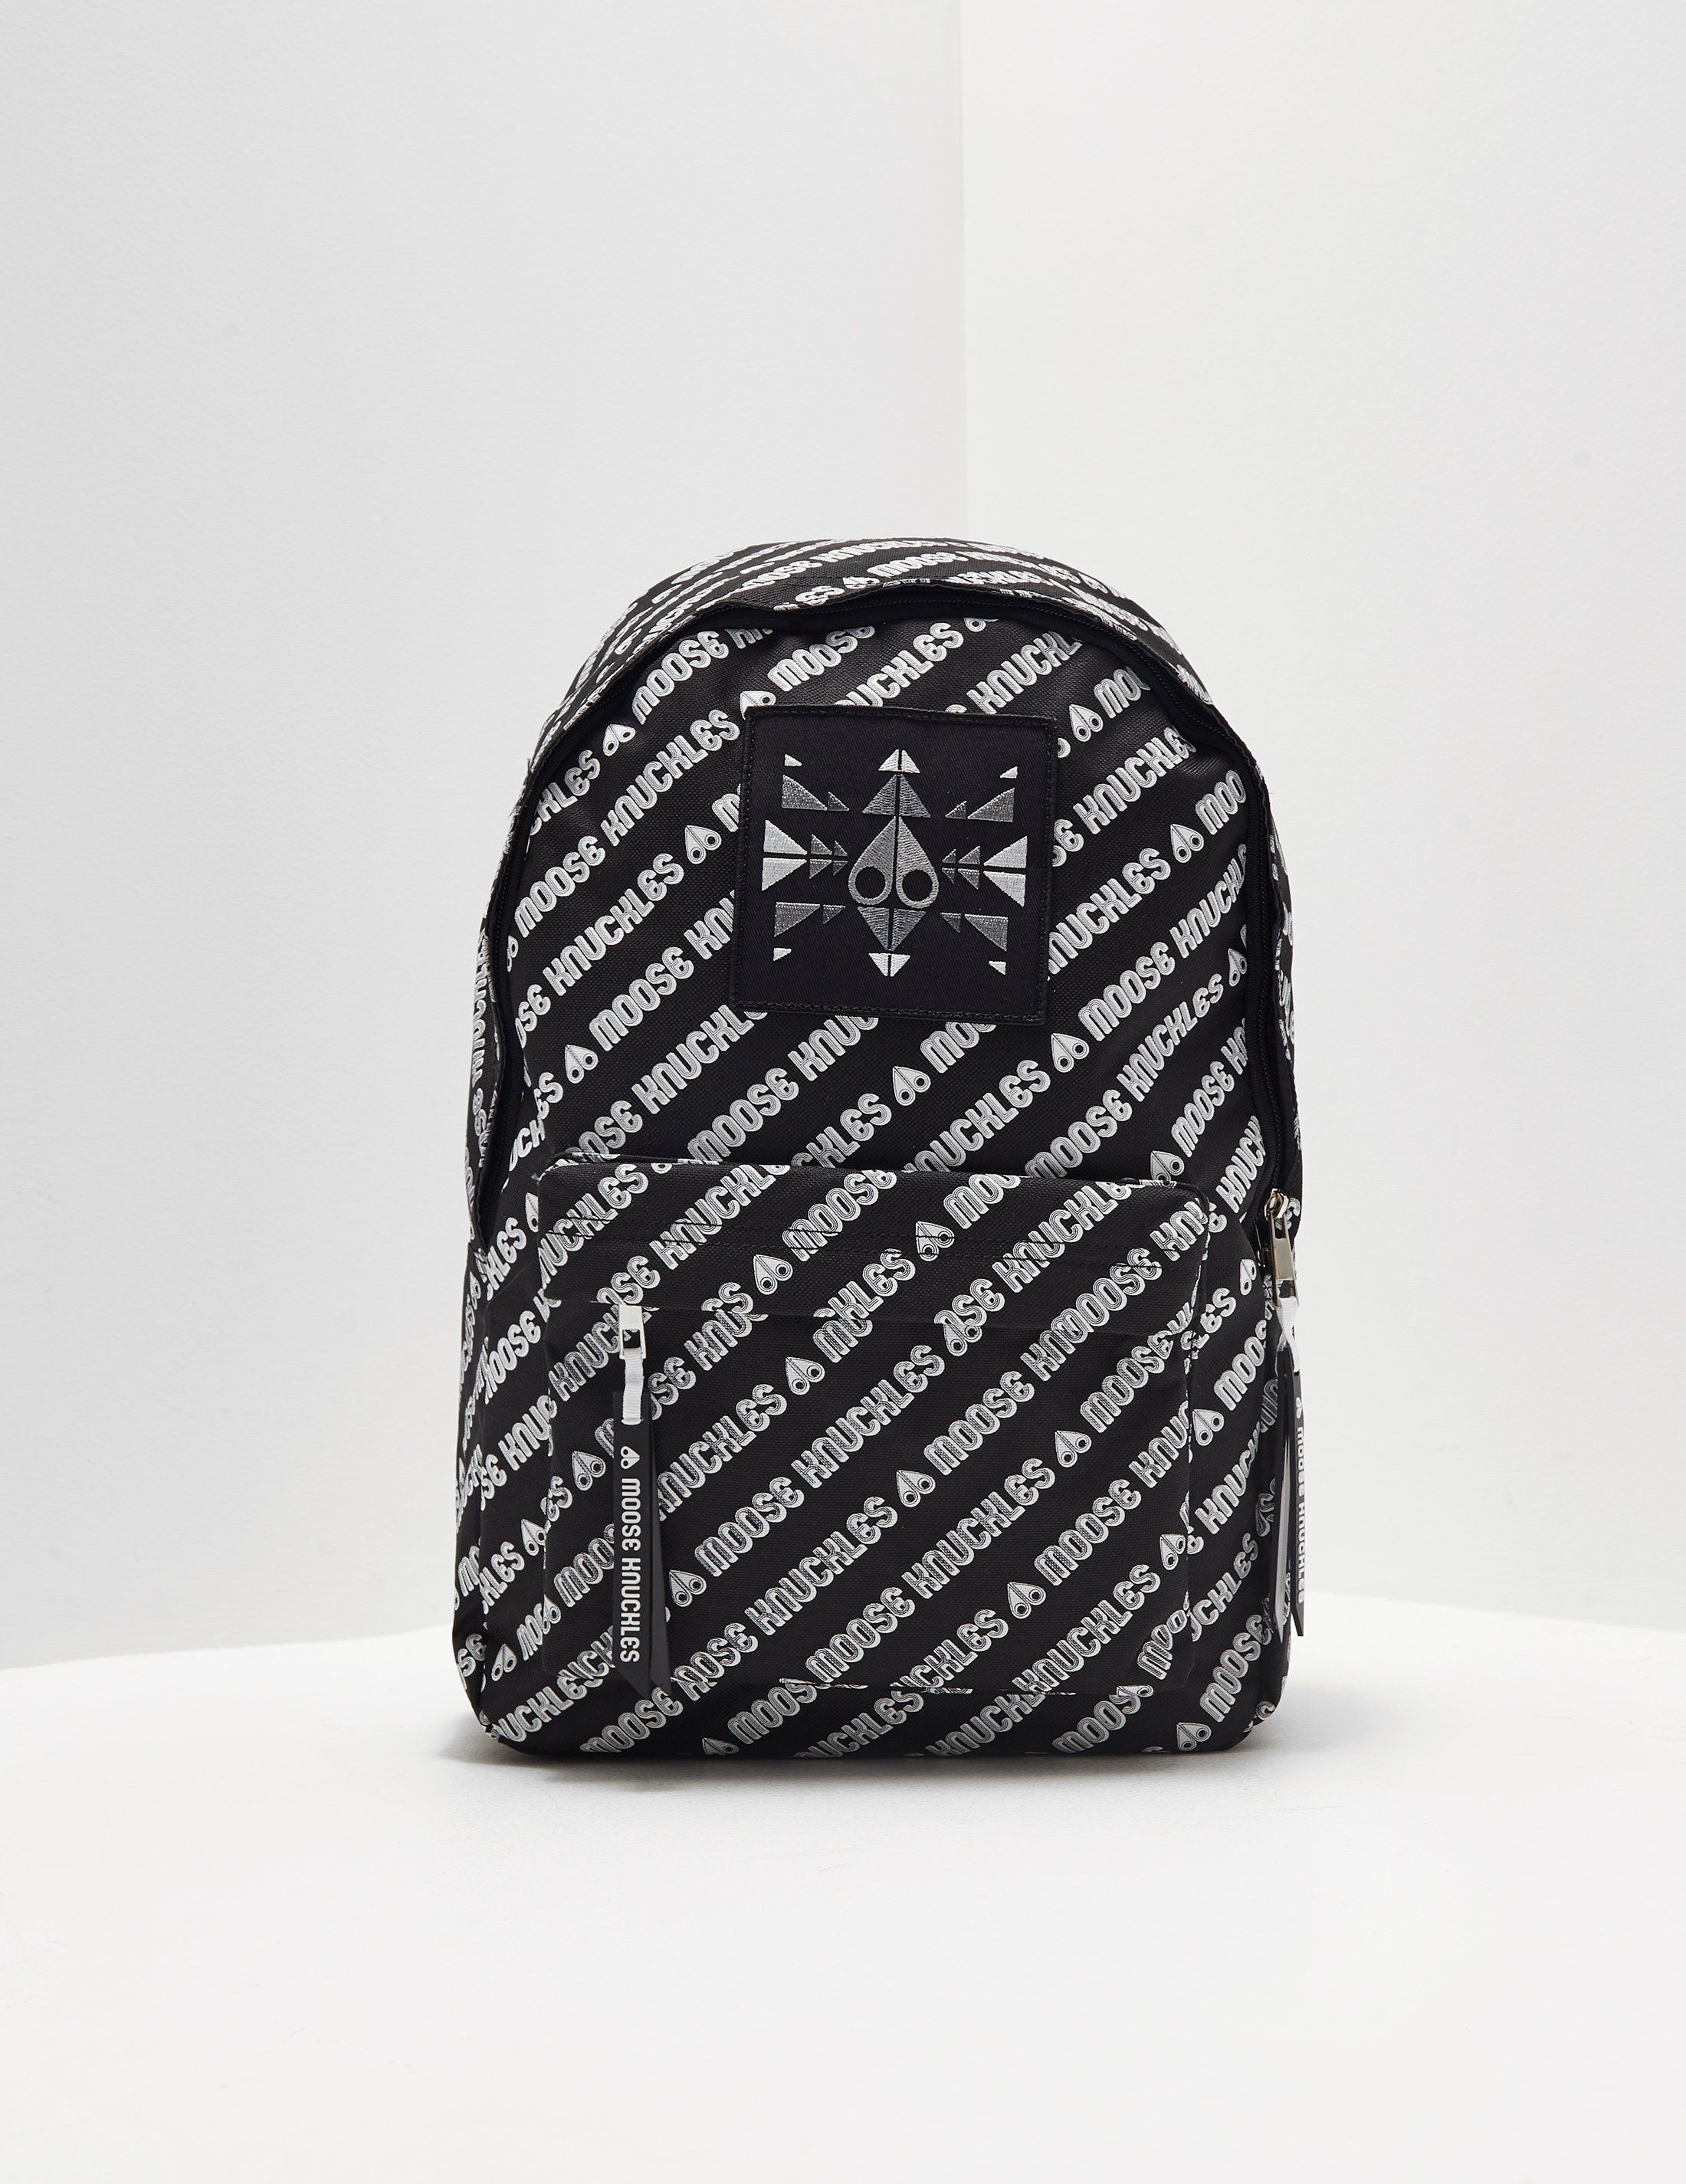 Moose Knuckles Logomania Backpack